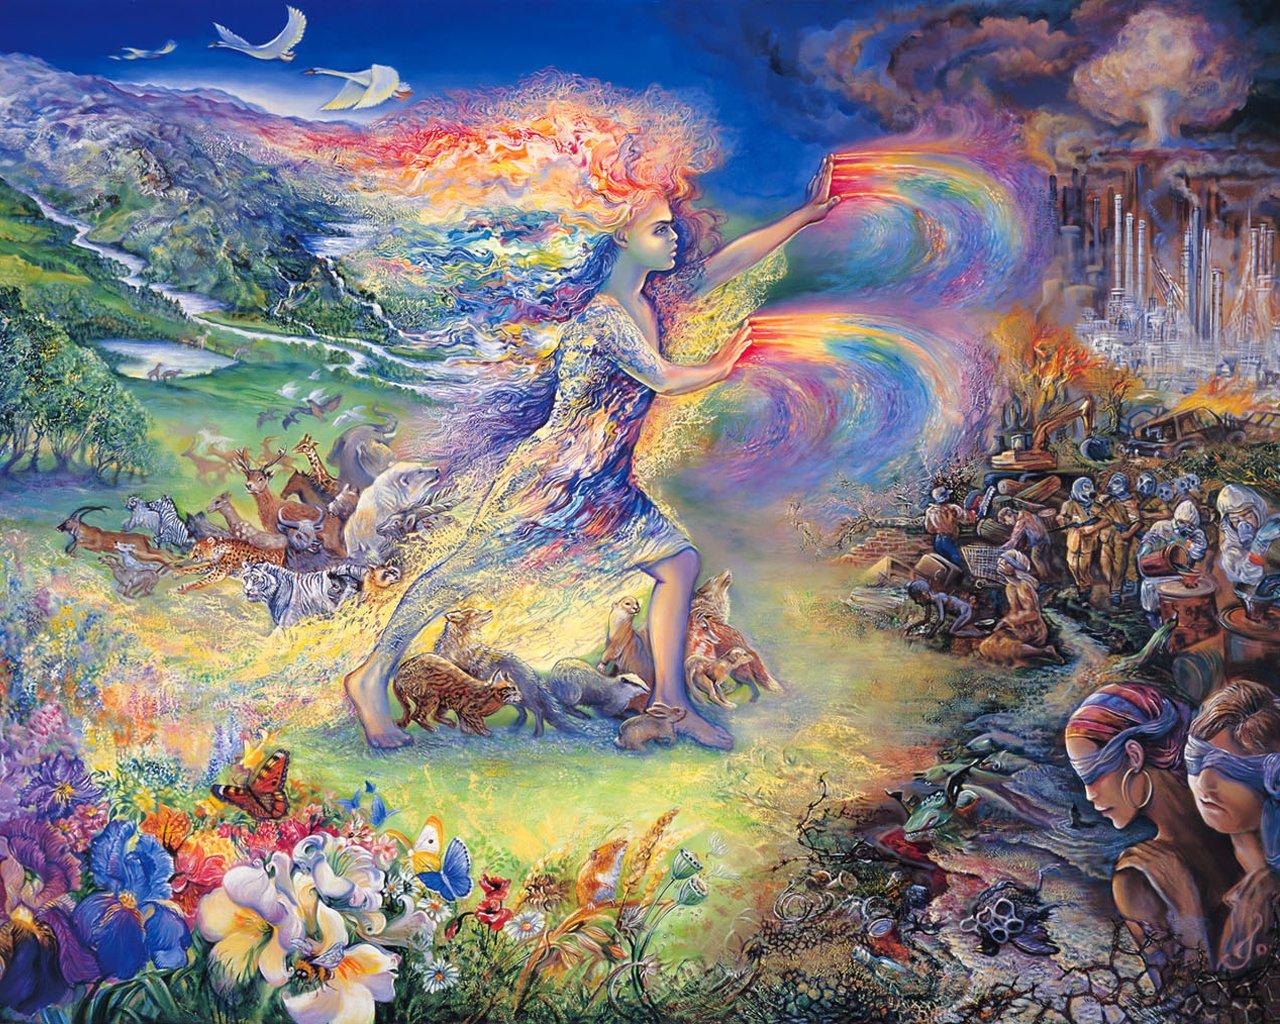 [47+] Free Heaven Wallpaper on WallpaperSafari